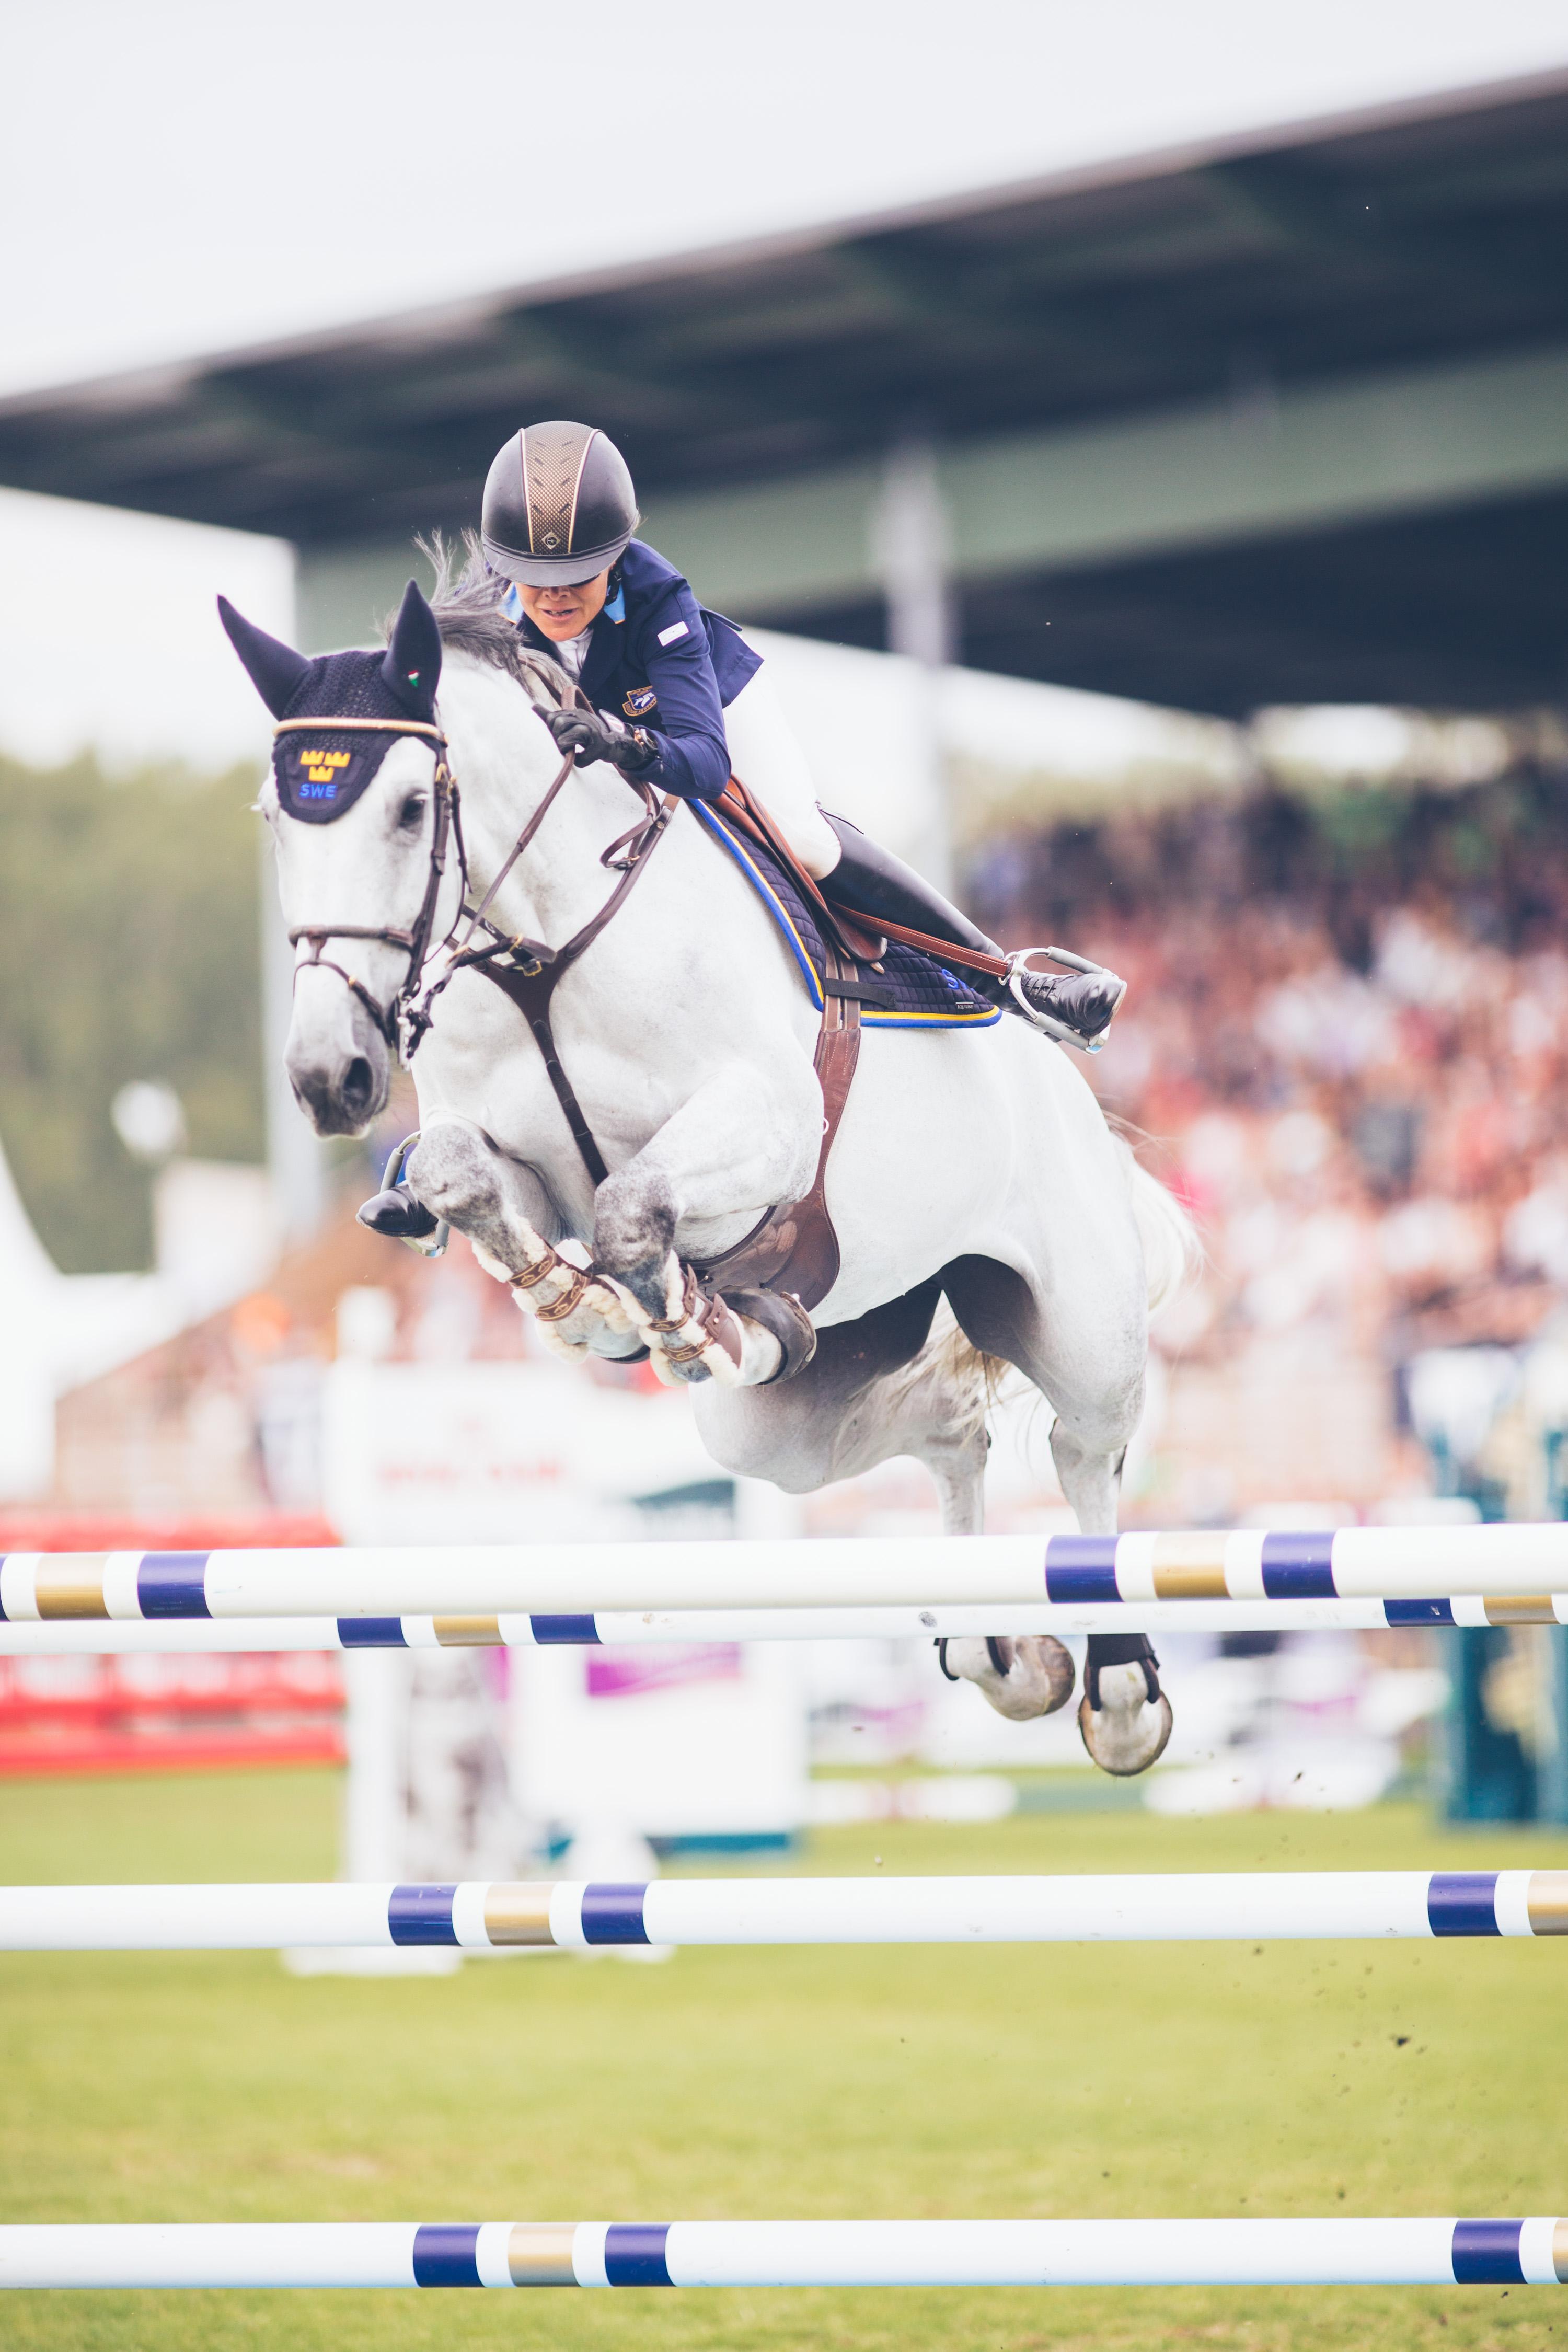 Andrea_Berlin_Falsterbo_Horse_Show-9413